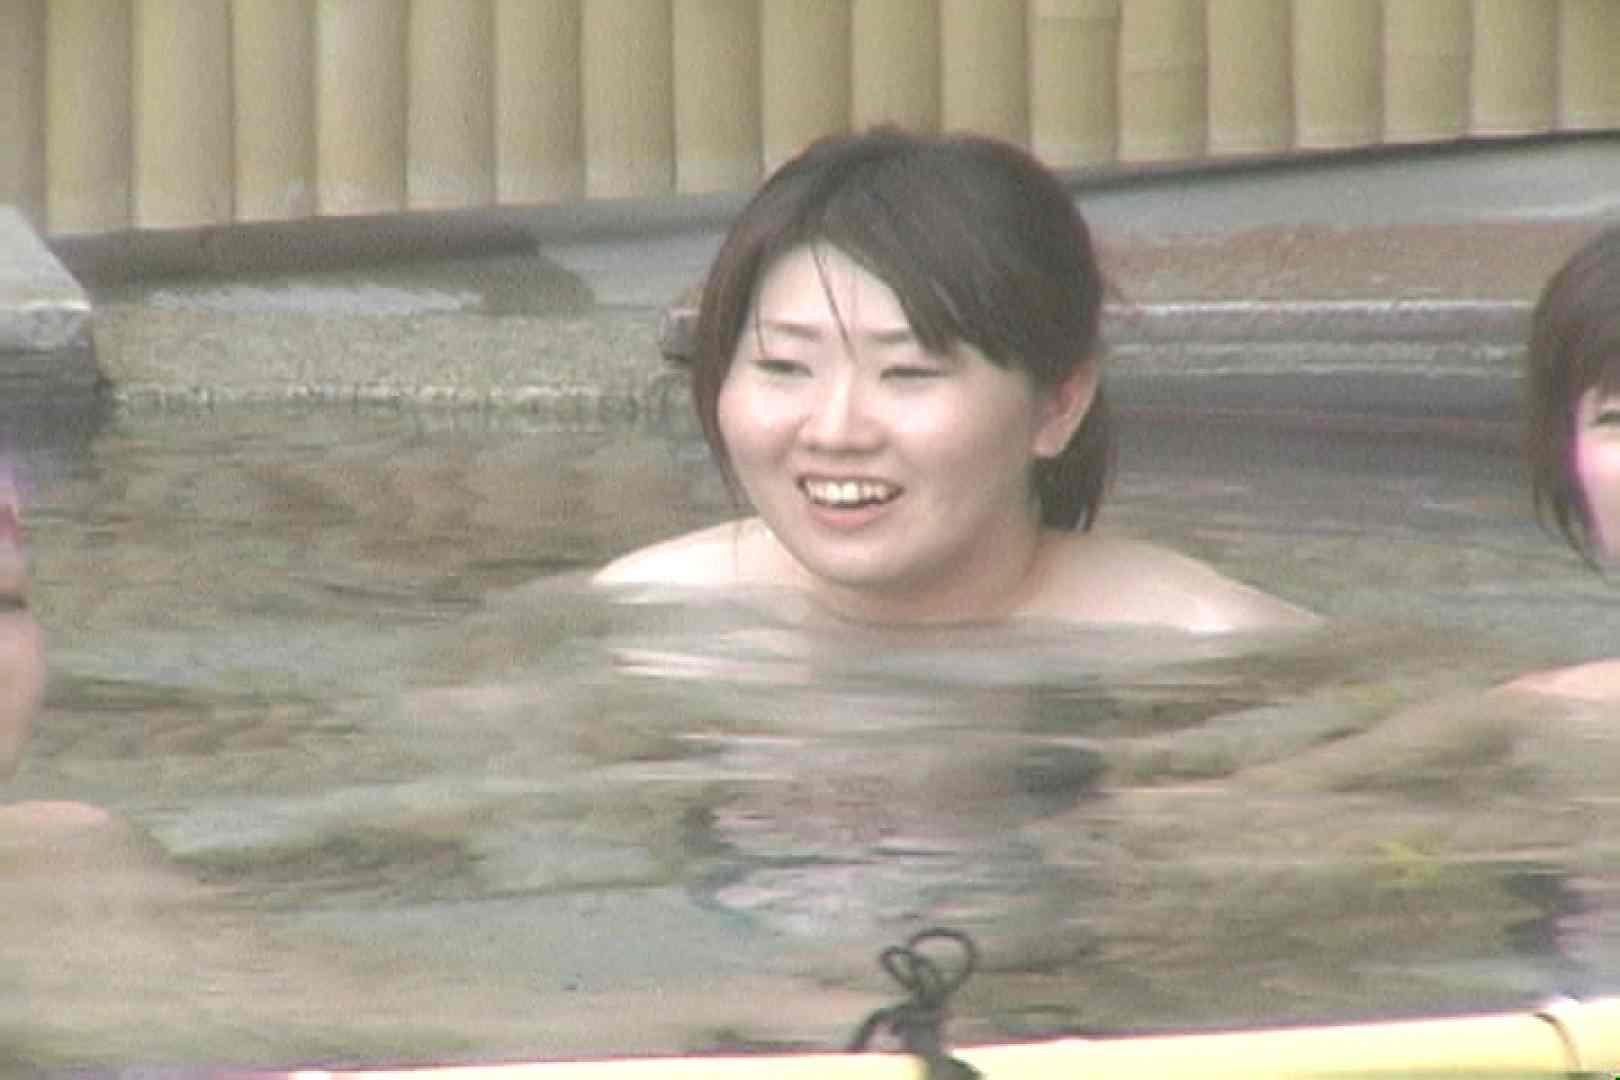 Aquaな露天風呂Vol.25 盗撮師作品  72pic 72